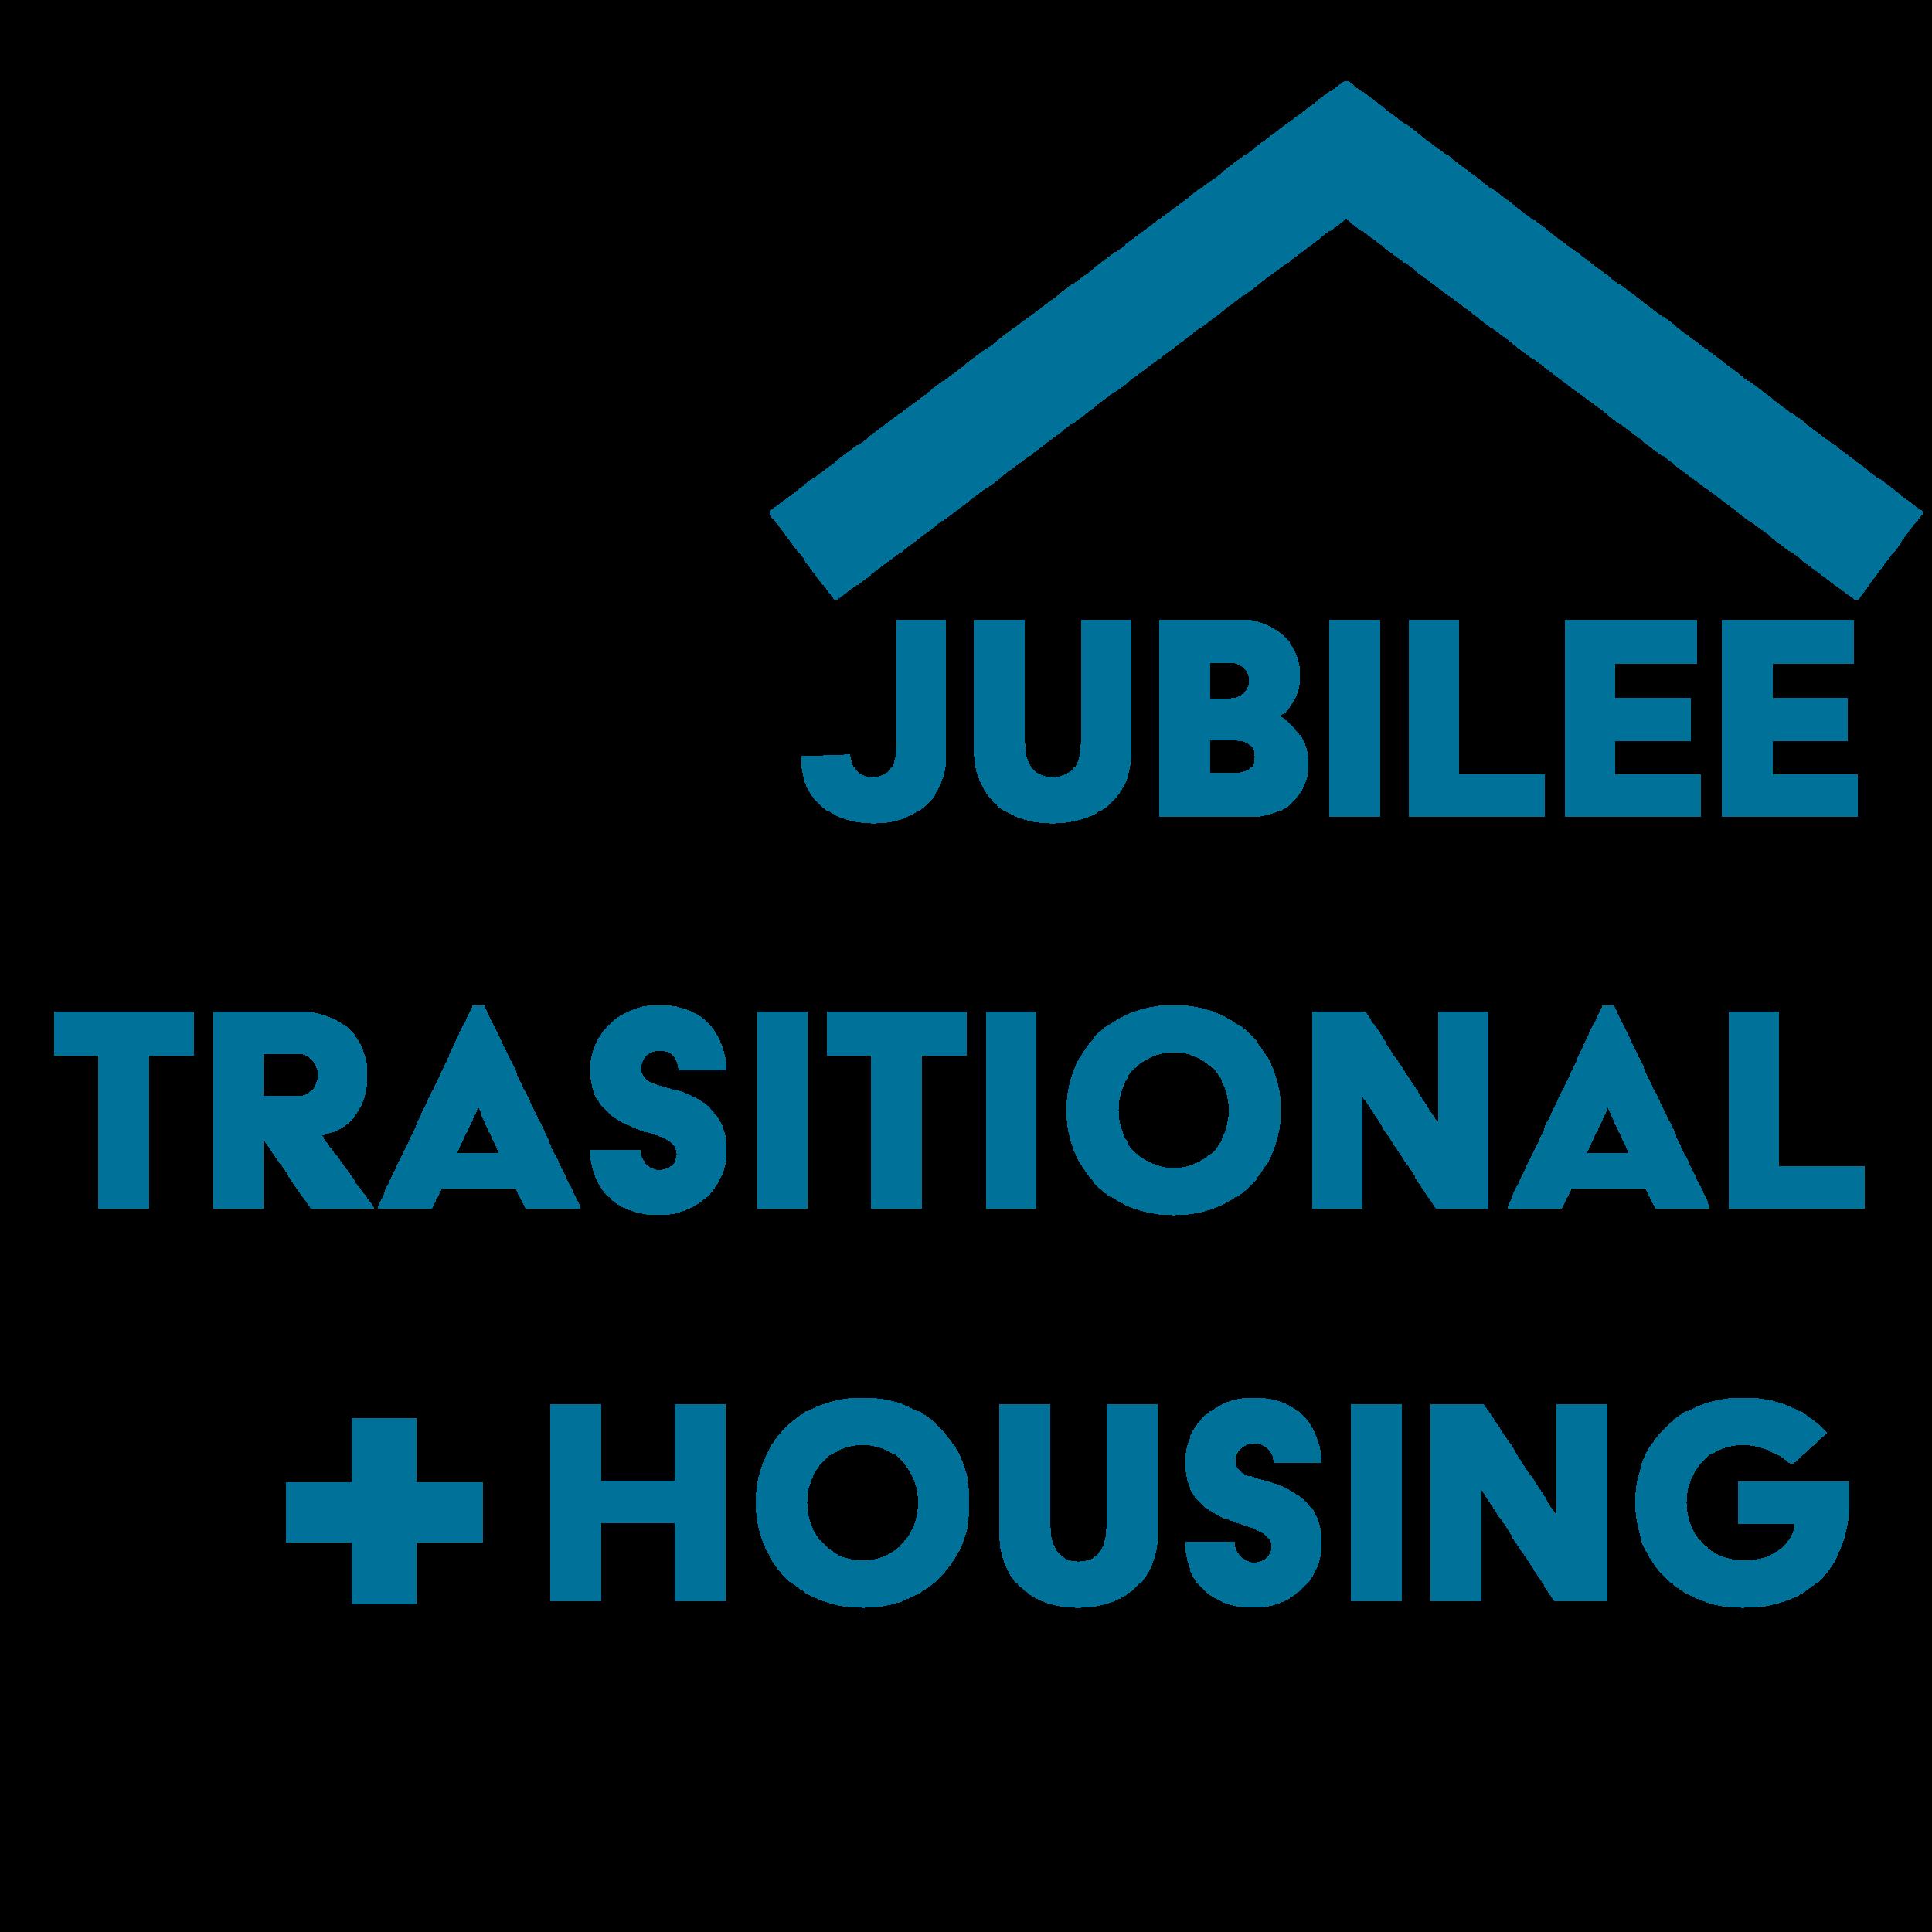 Jubilee Housing.png